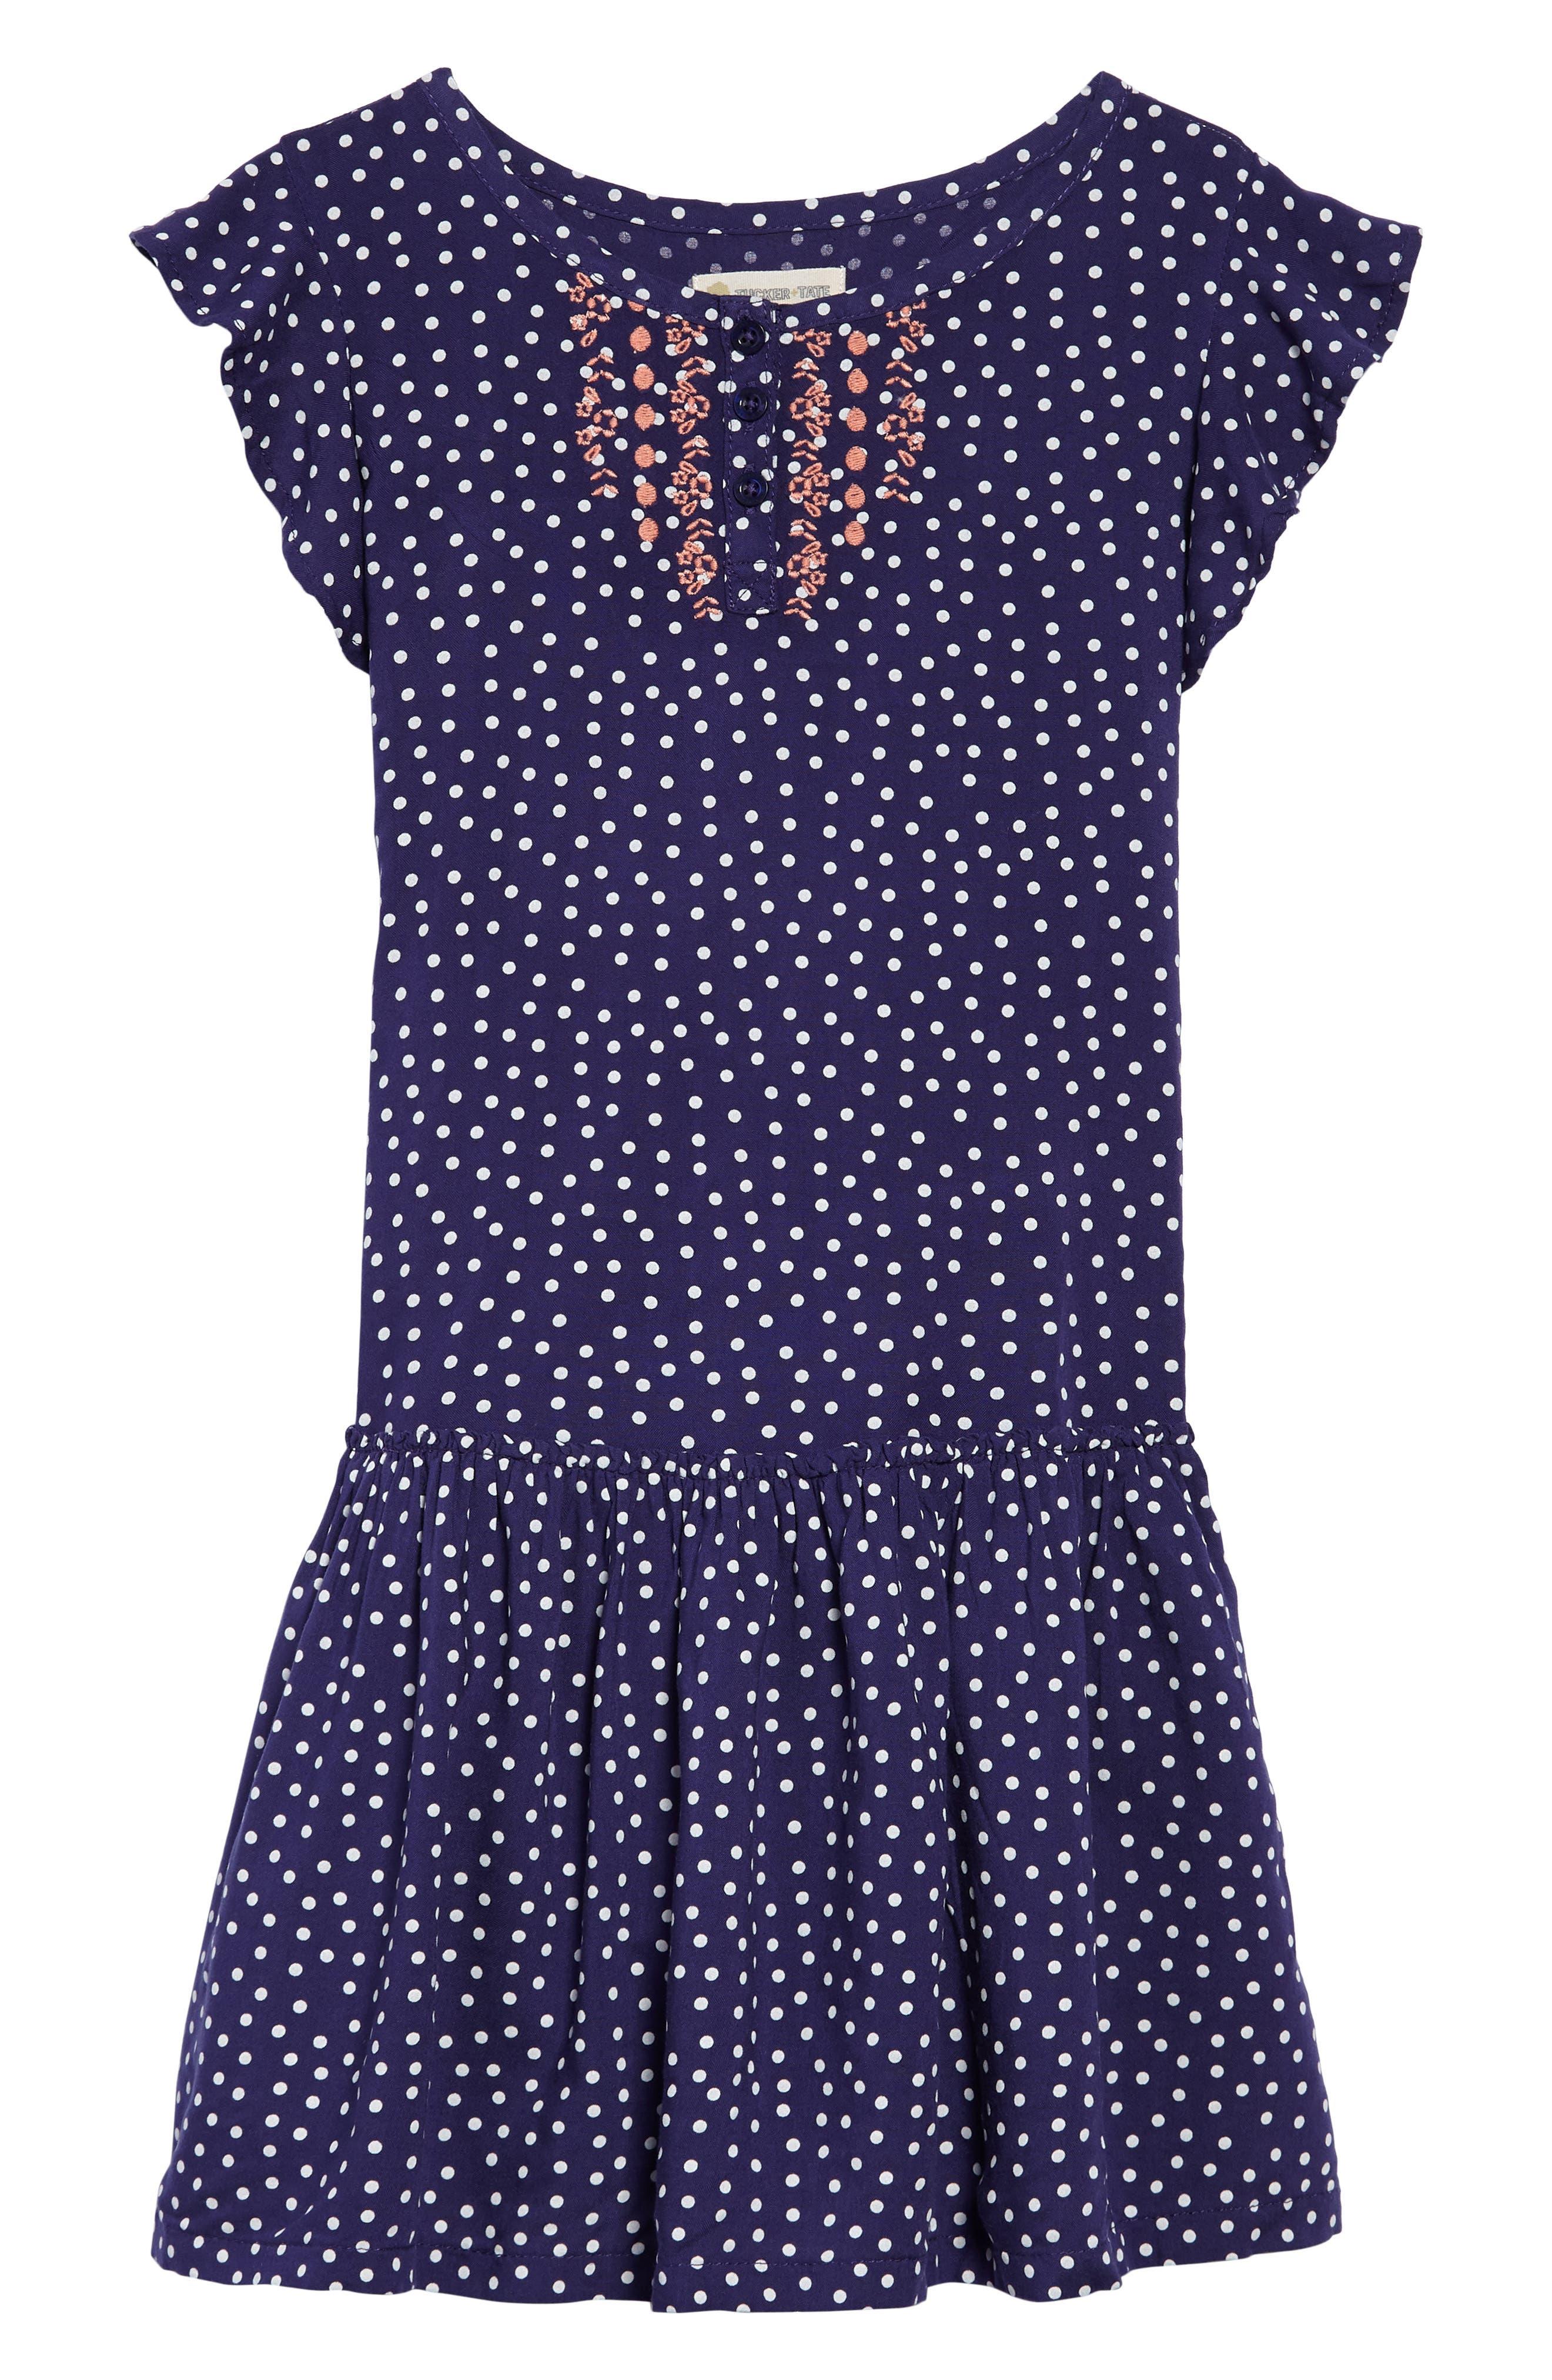 Print Flutter Sleeve Dress,                             Main thumbnail 1, color,                             410